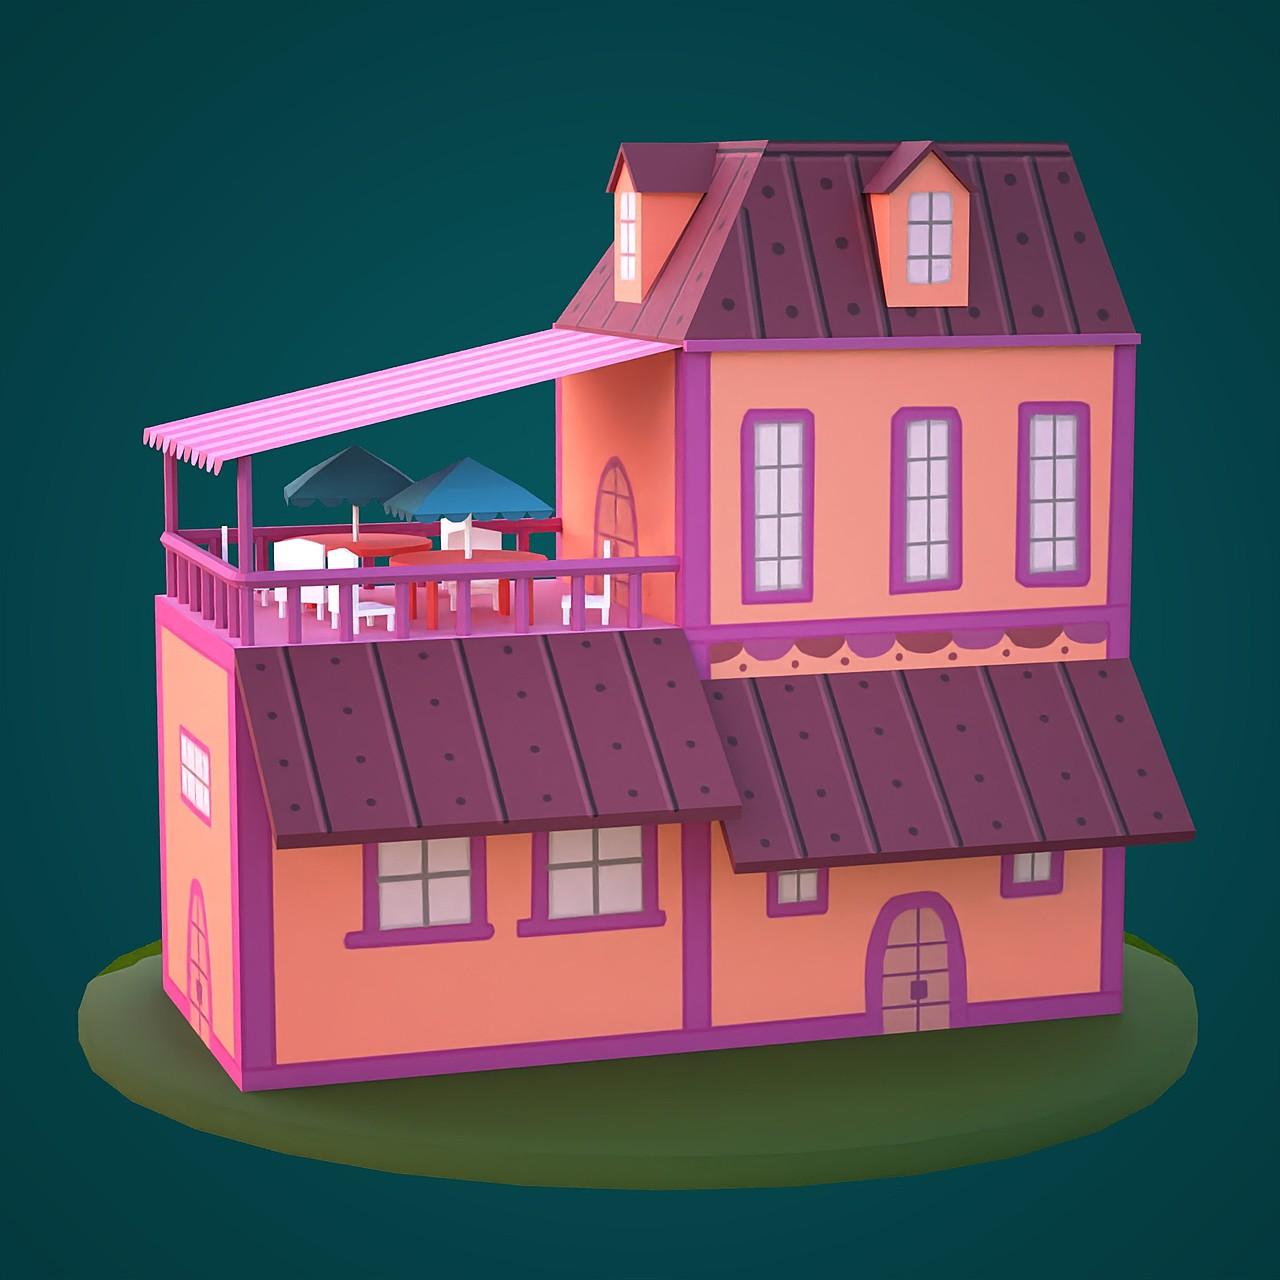 The Land of Ooo - Orange house